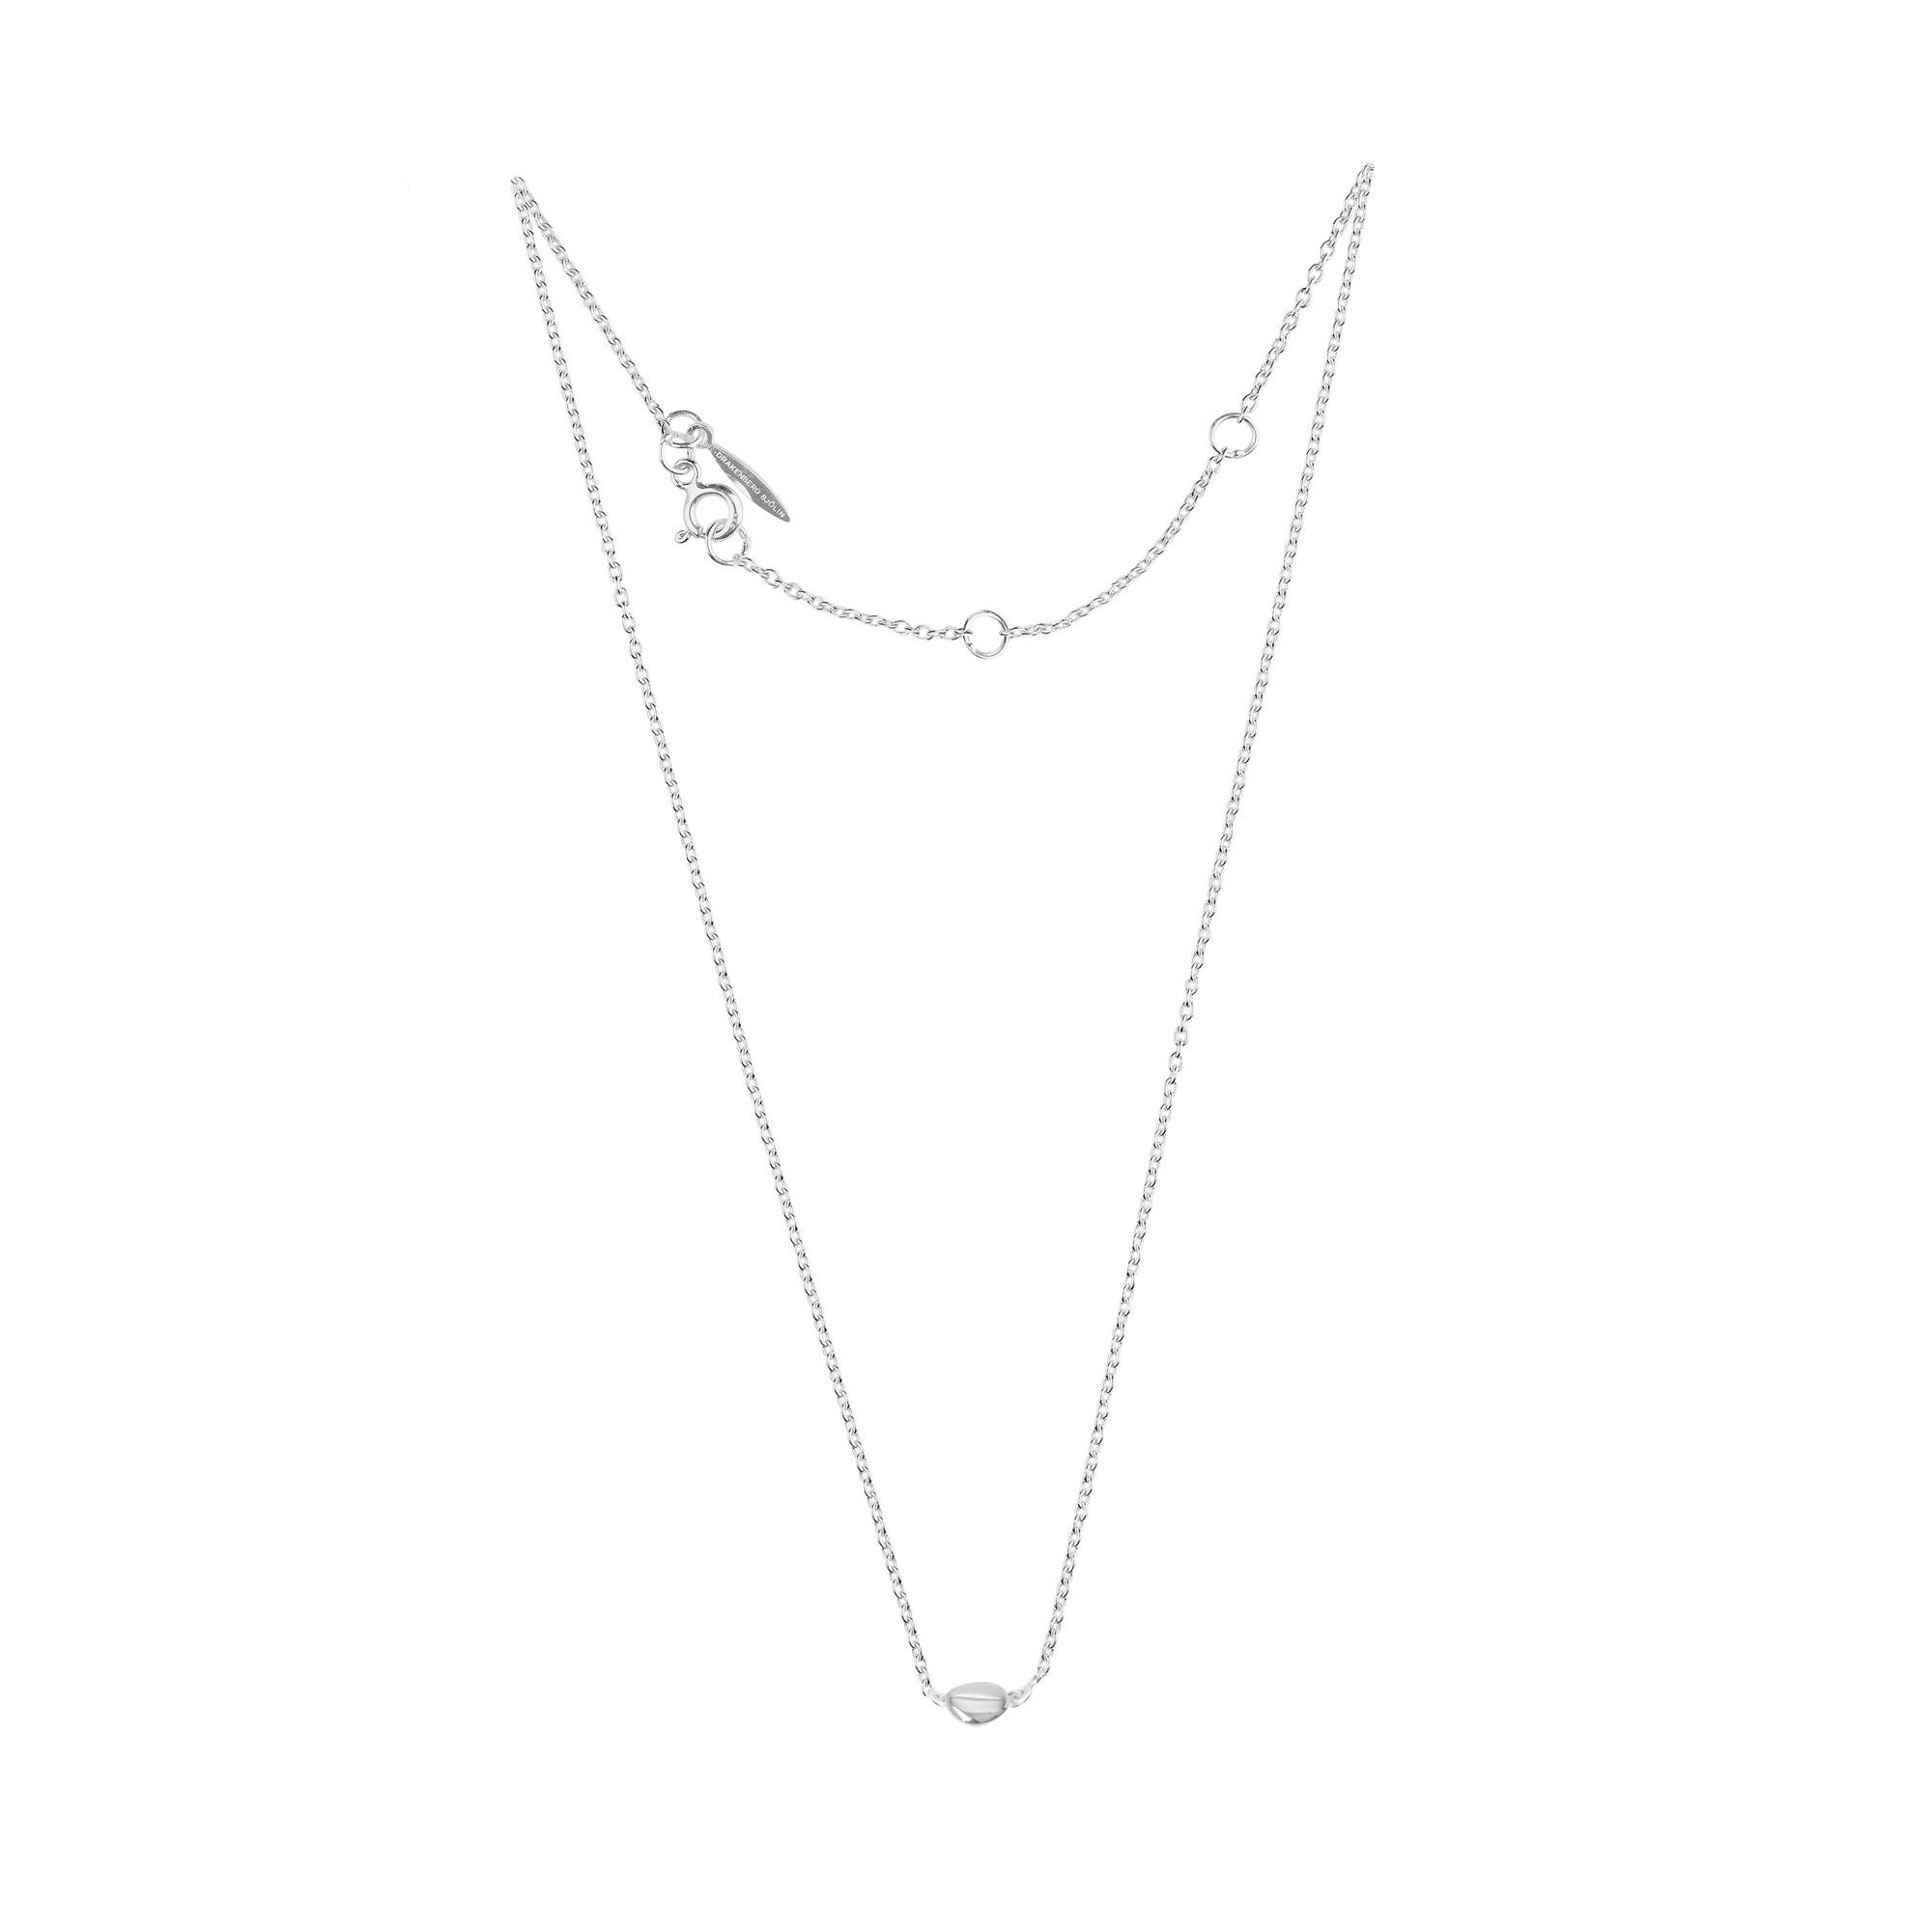 Morning-Dew-petite-necklace-LQ